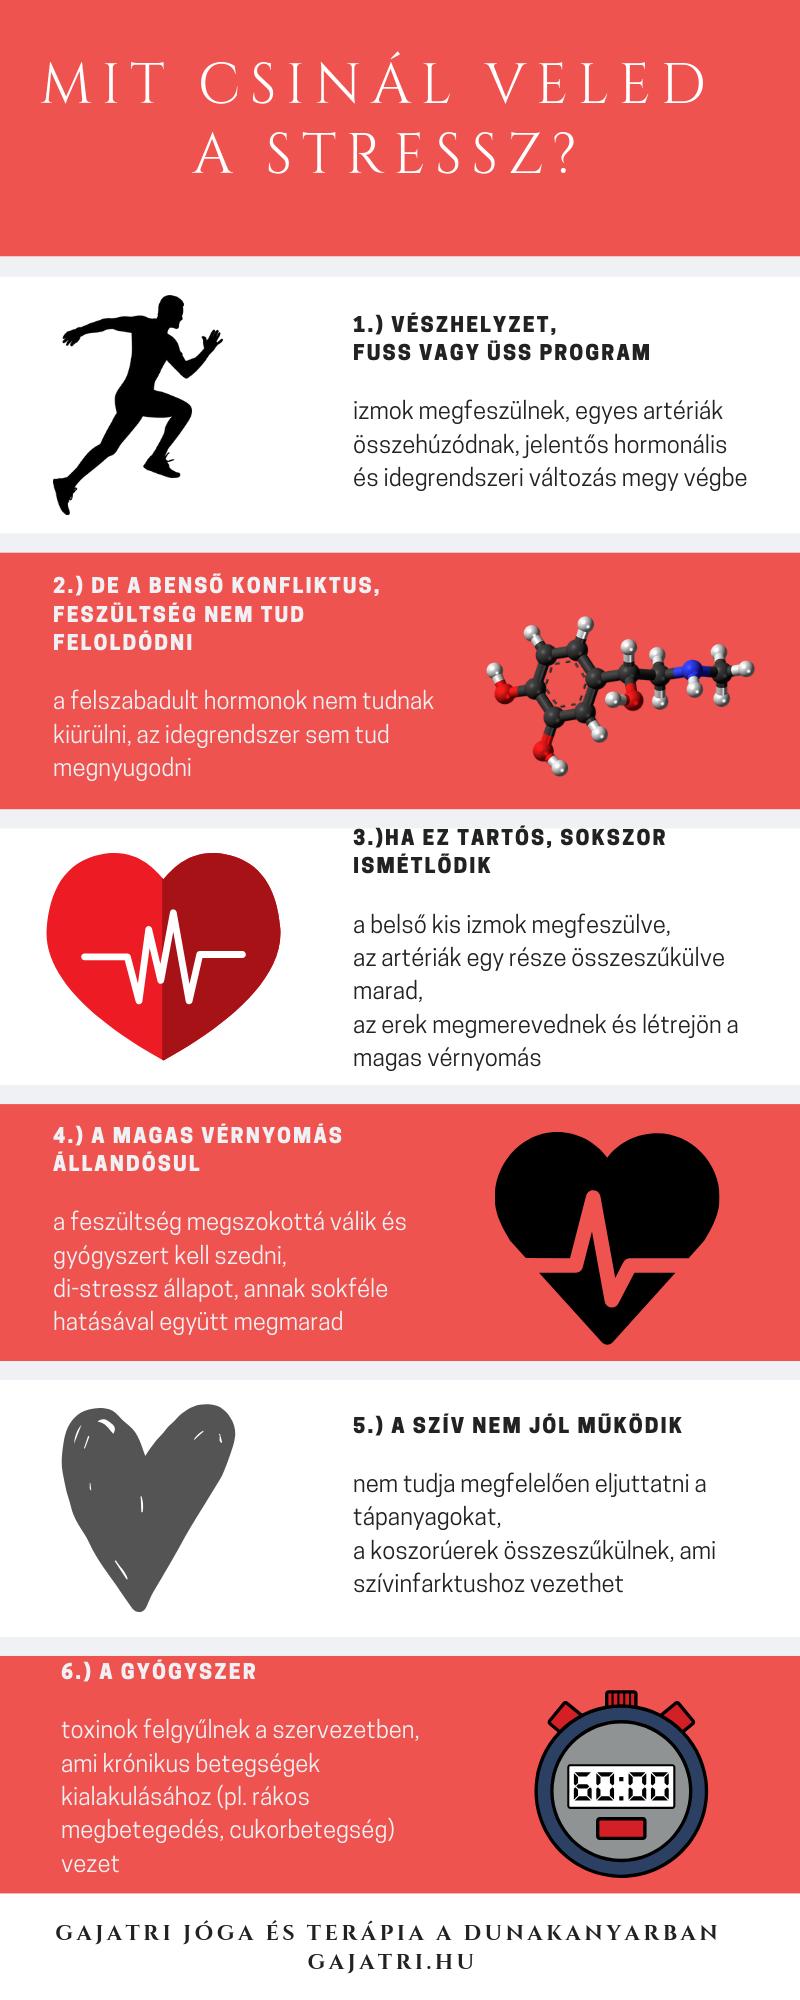 magas vérnyomás és hormonok)